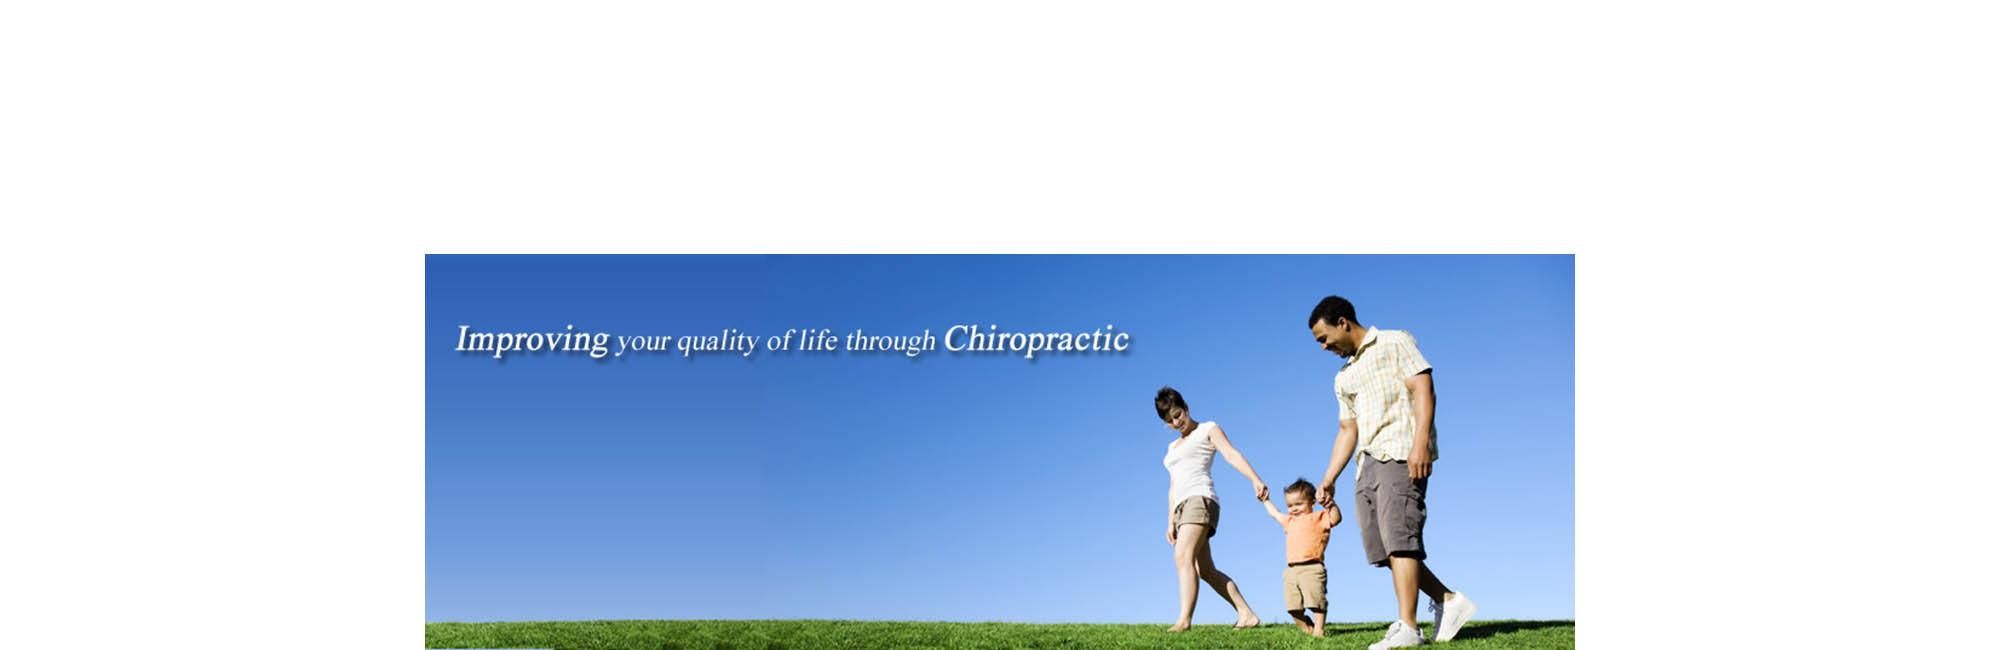 St. Paul Chiropractic & Natural Medicine Center